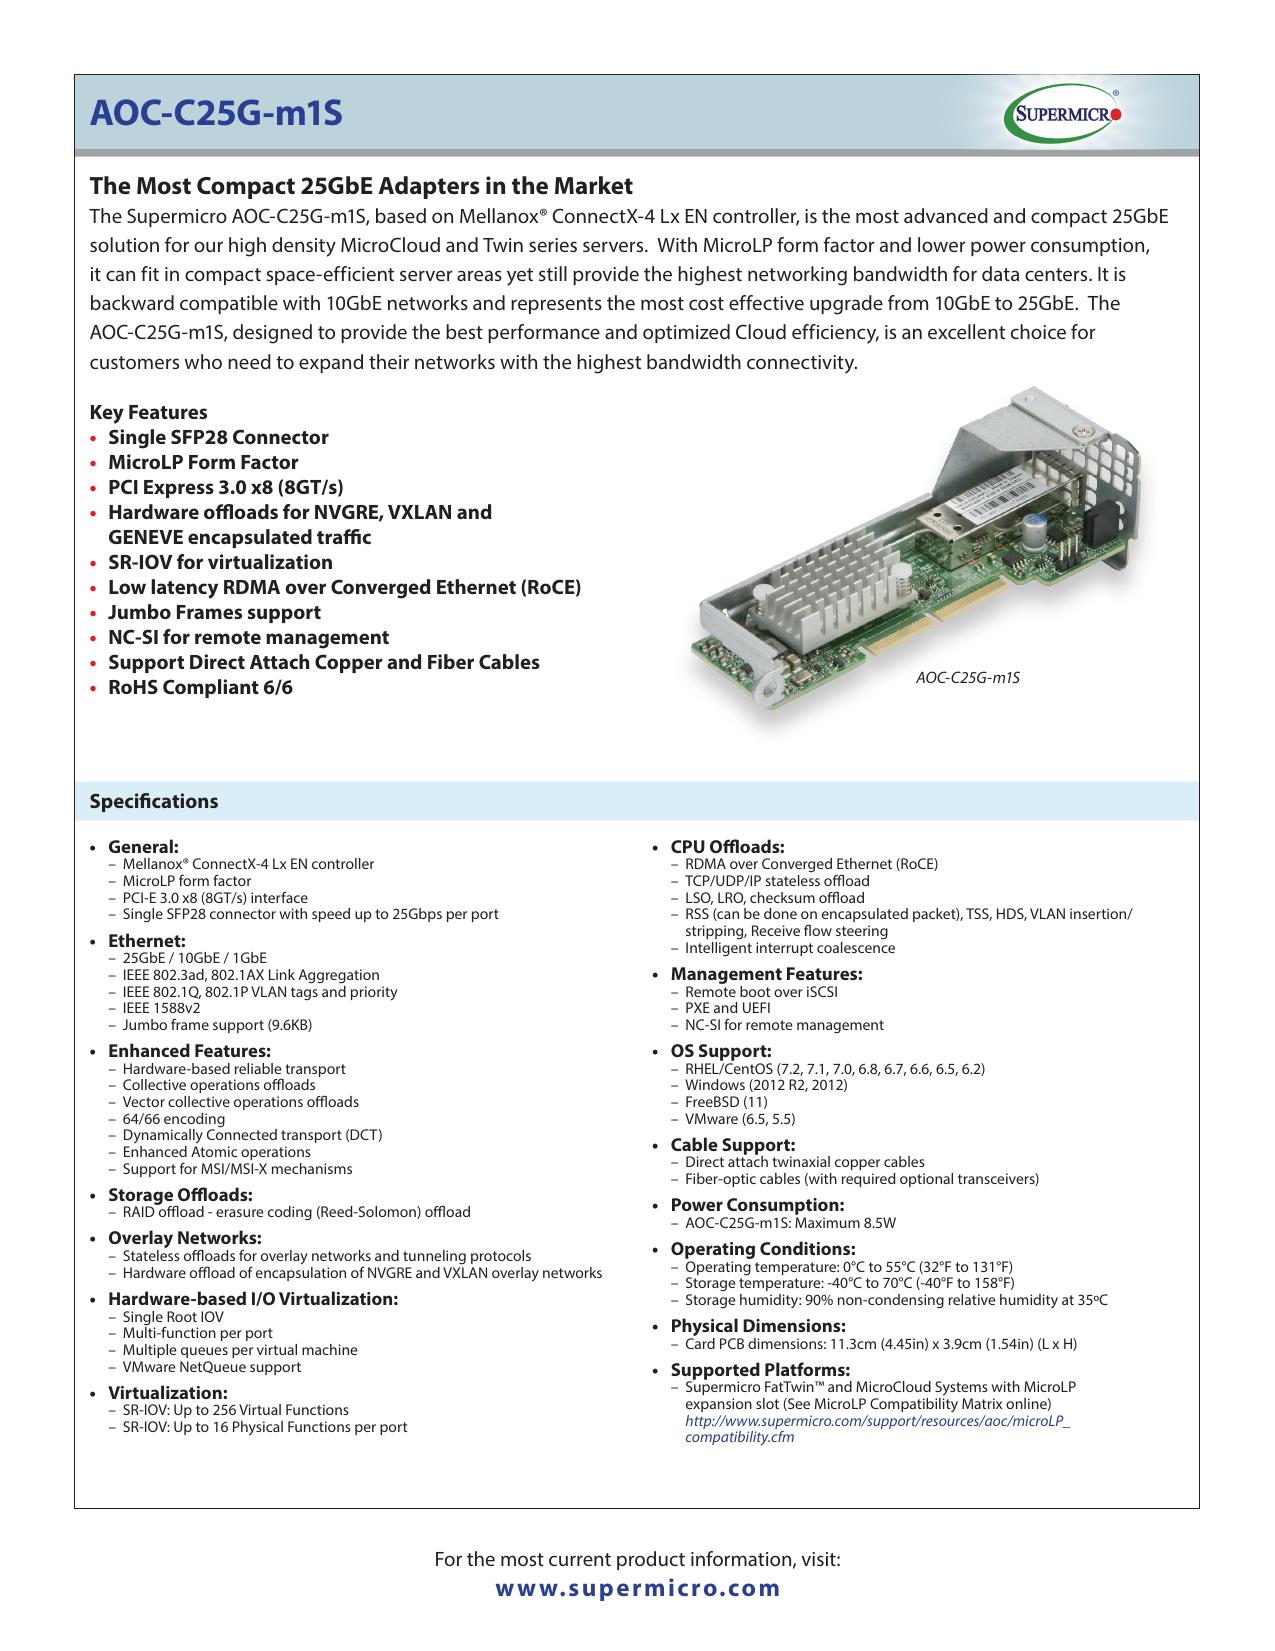 AOC-C25G-m1S | manualzz com